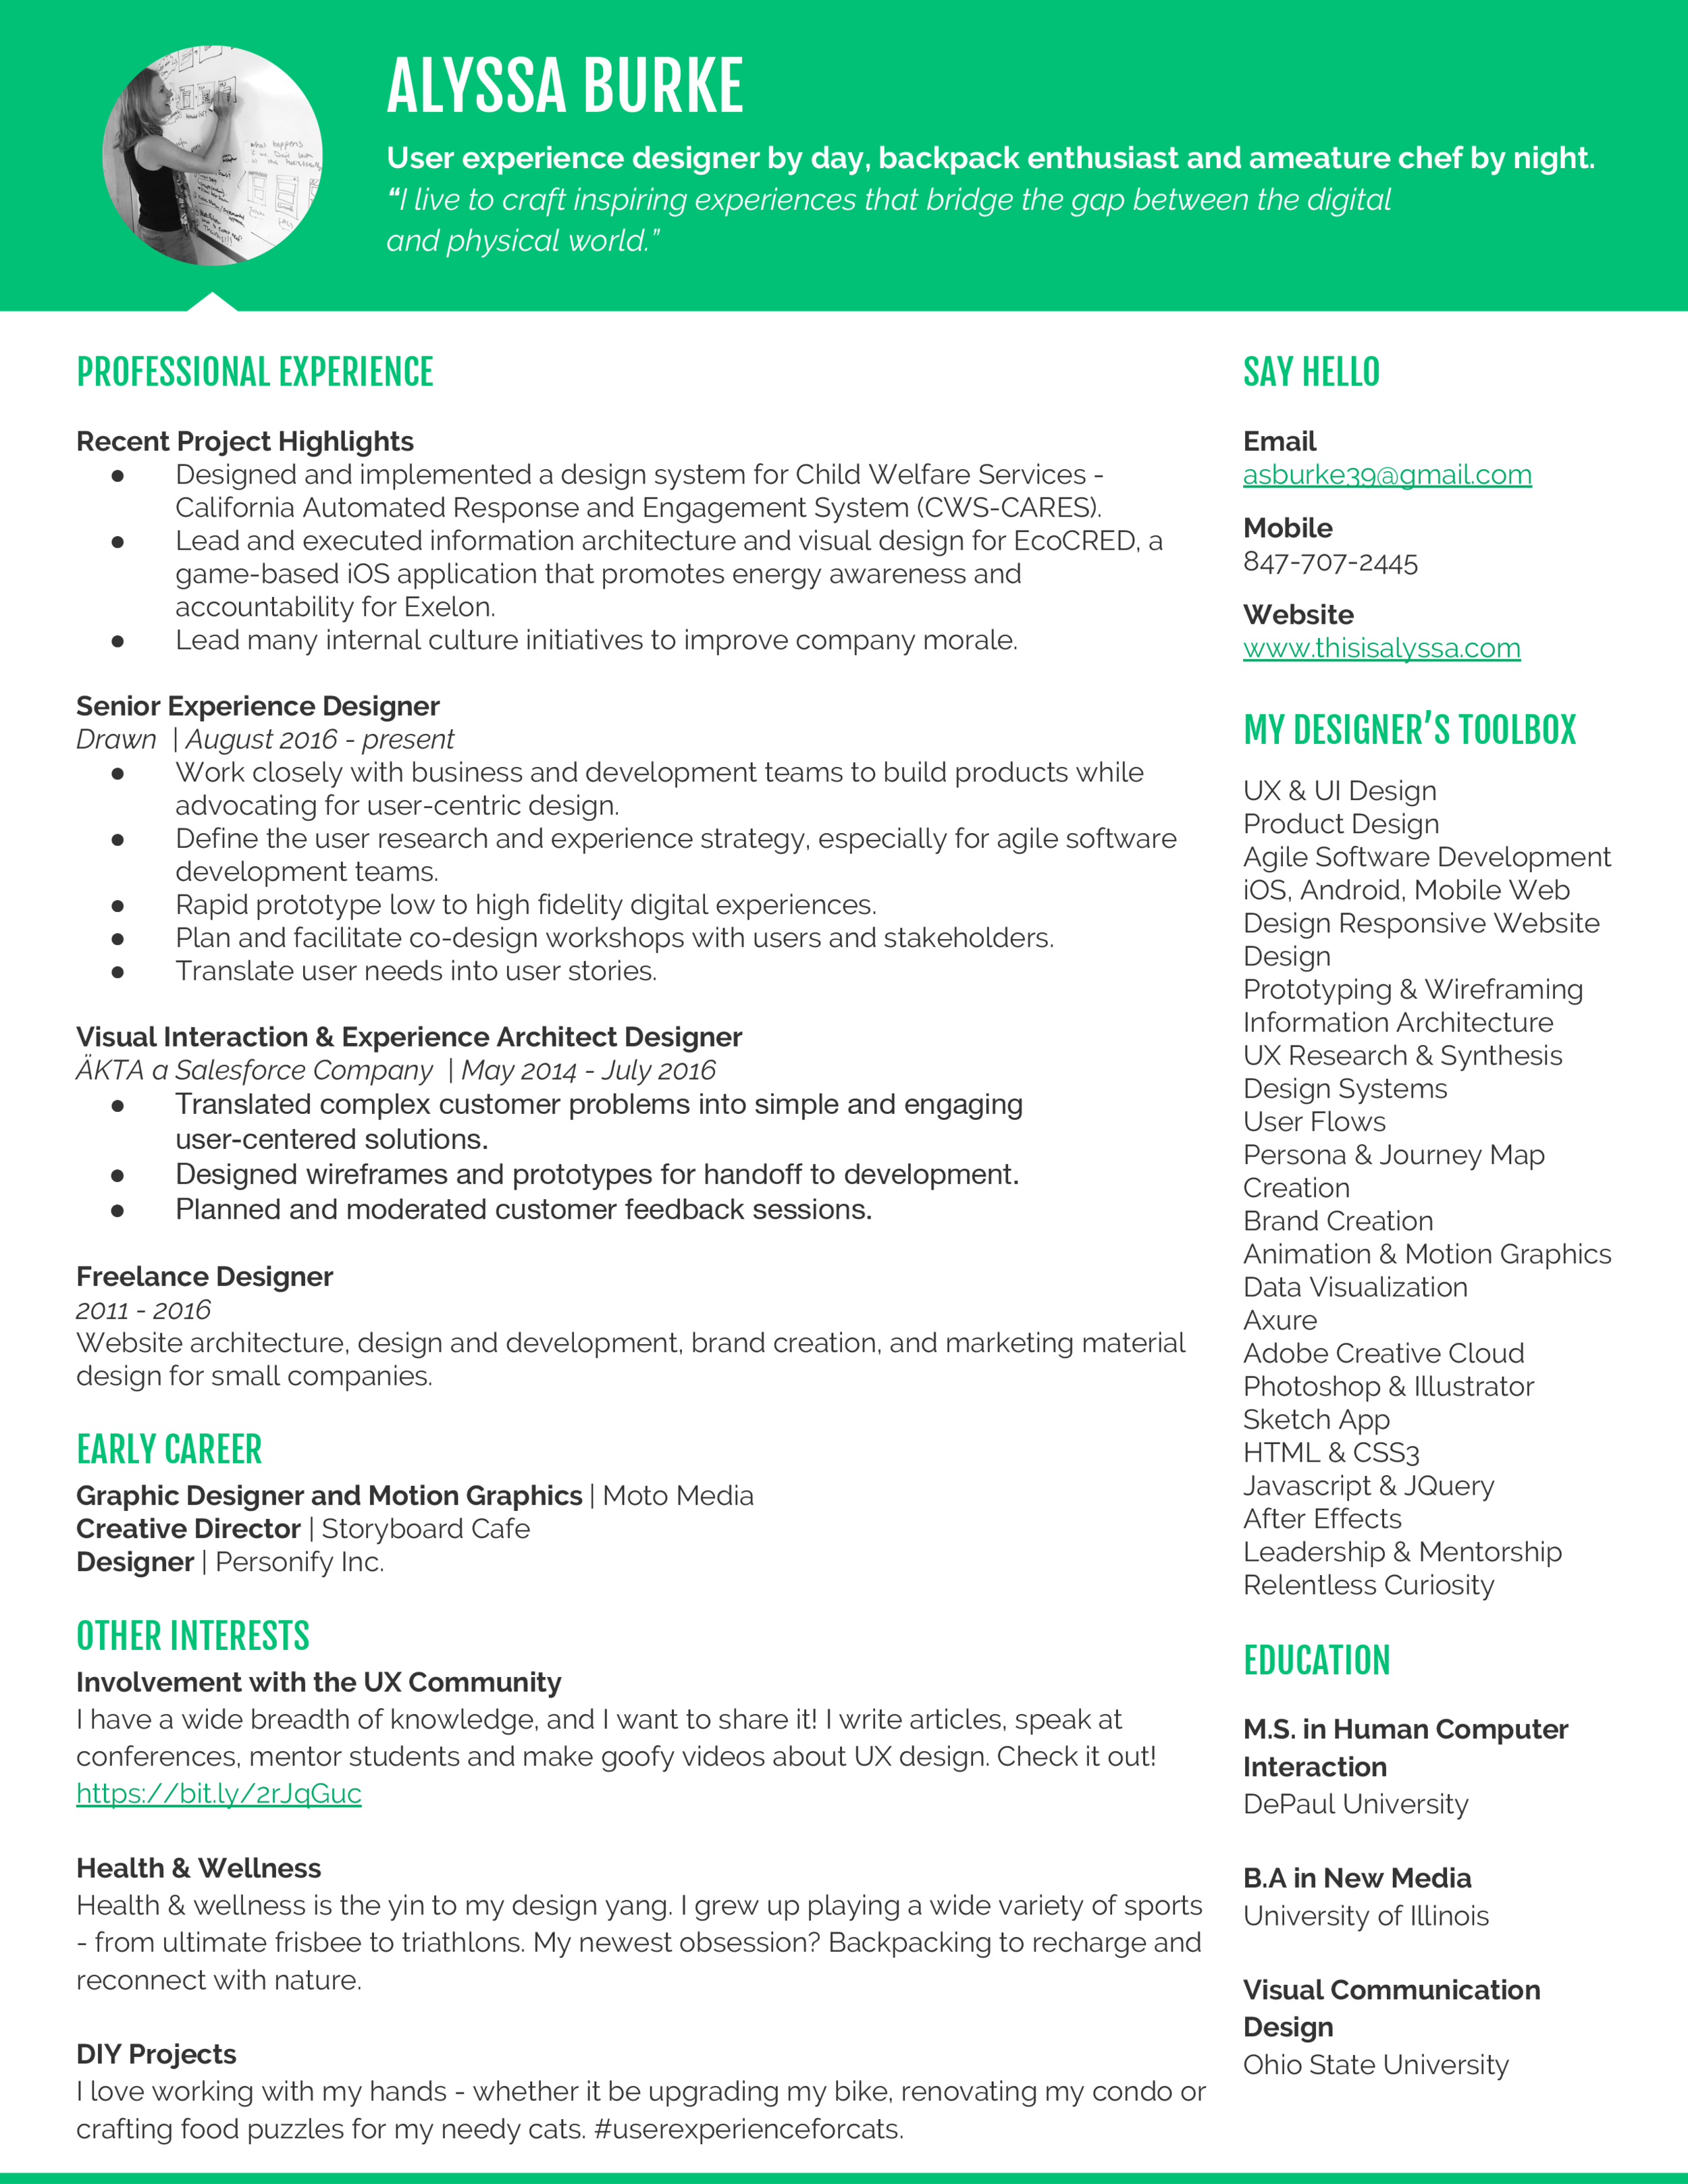 alyssa-burke-resume.png